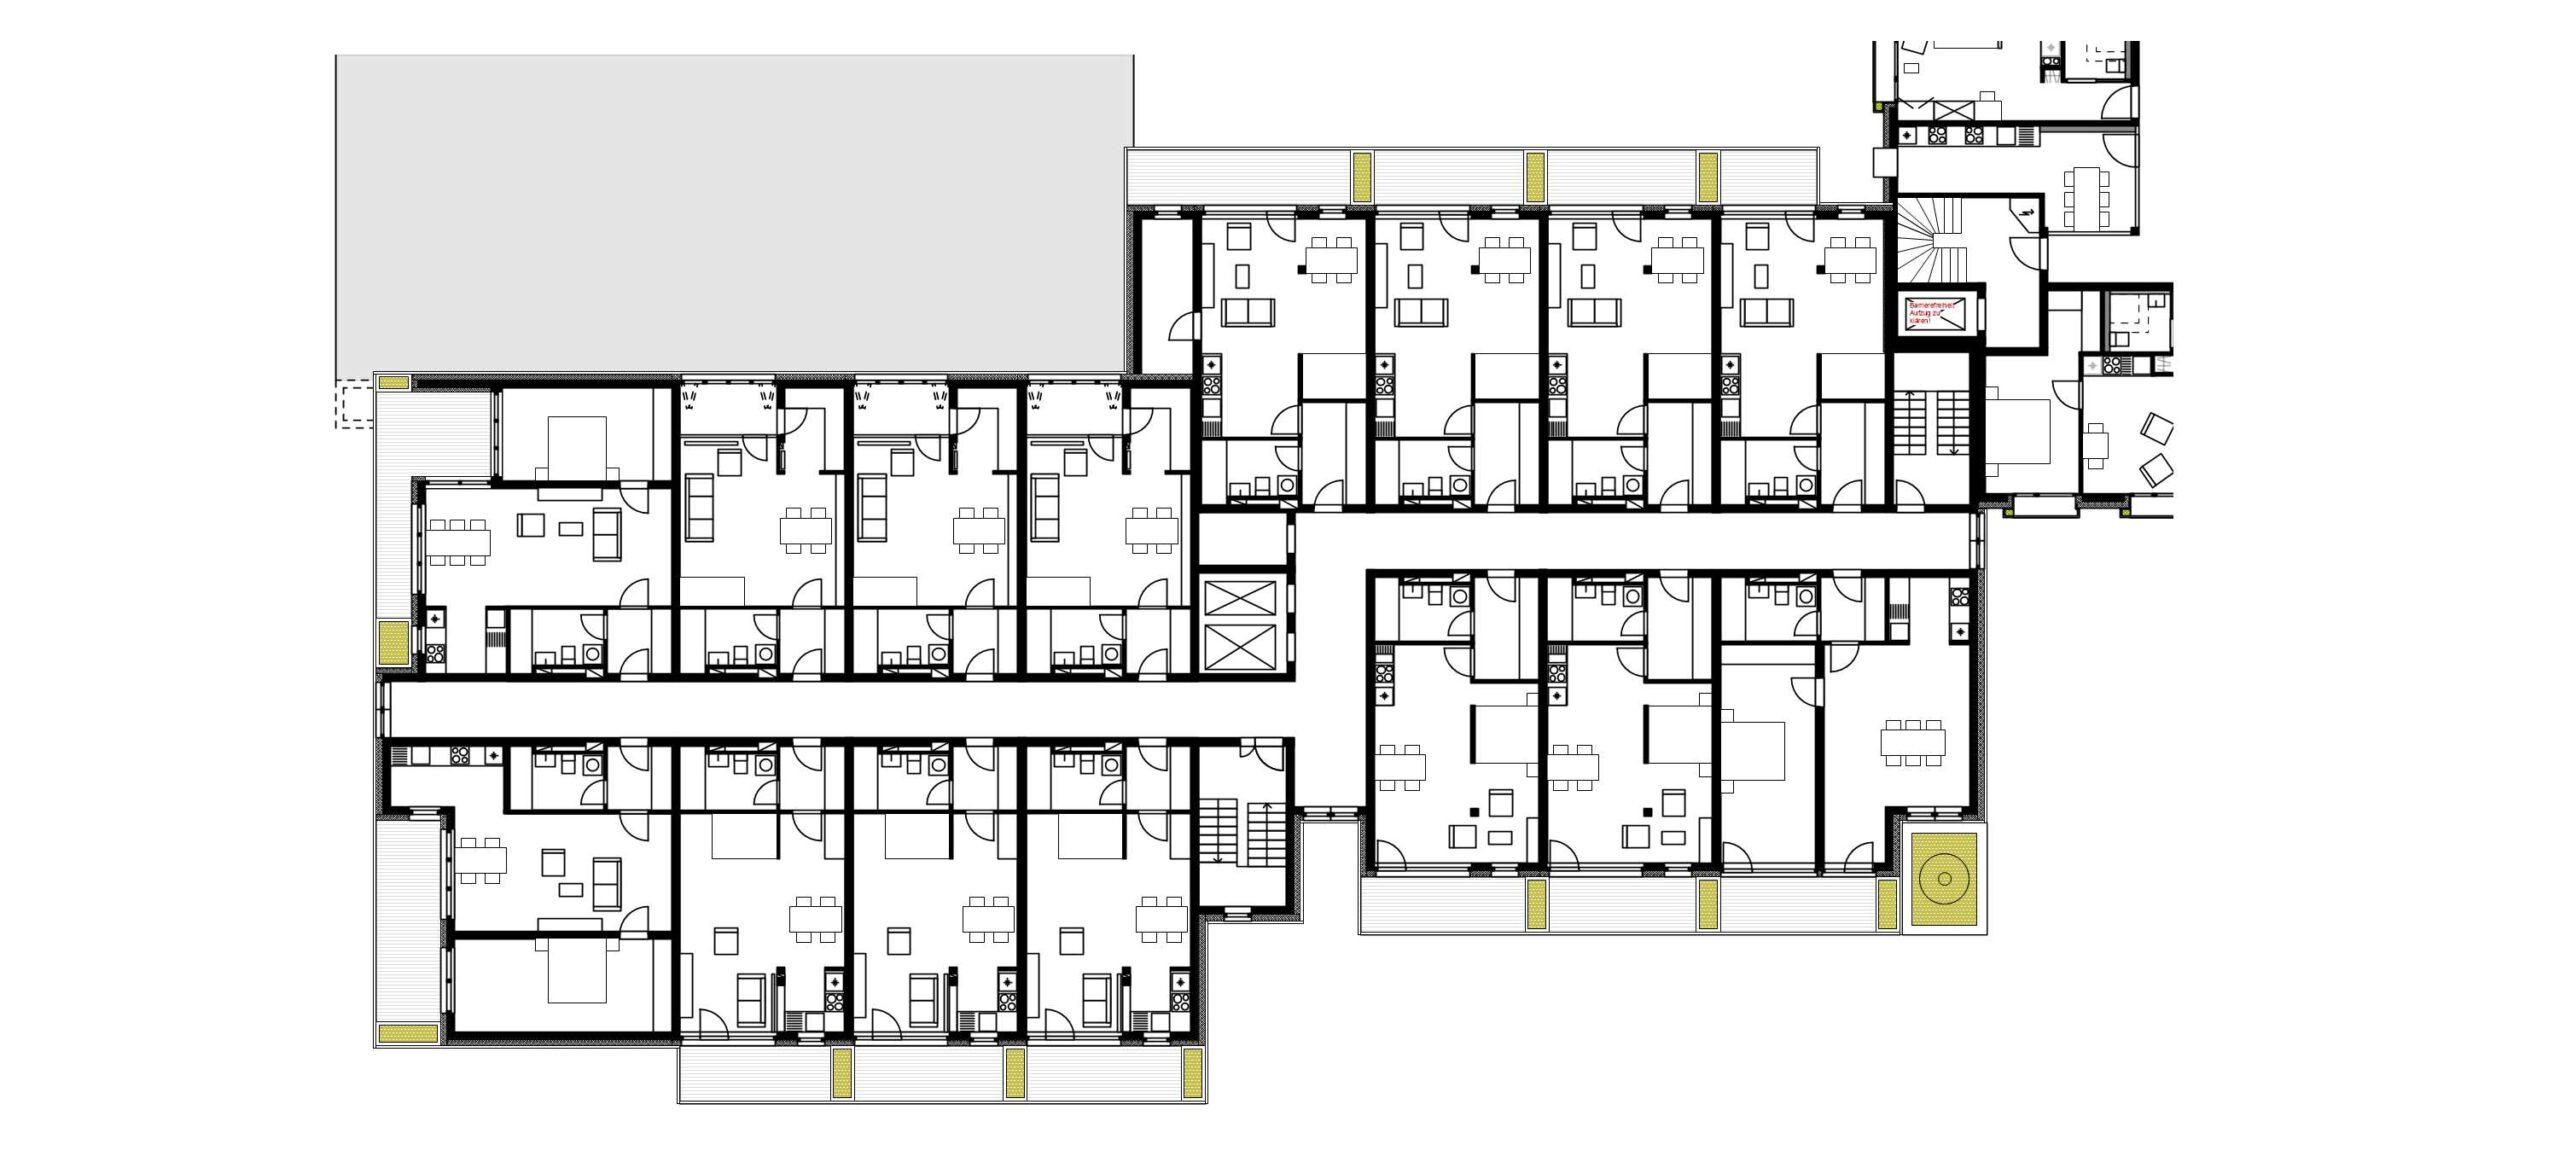 Projekt 377 Avrilléstraße Marktplatz Schwalbach Grundriss Regelgeschoss Wohnen FFM-ARCHITEKTEN